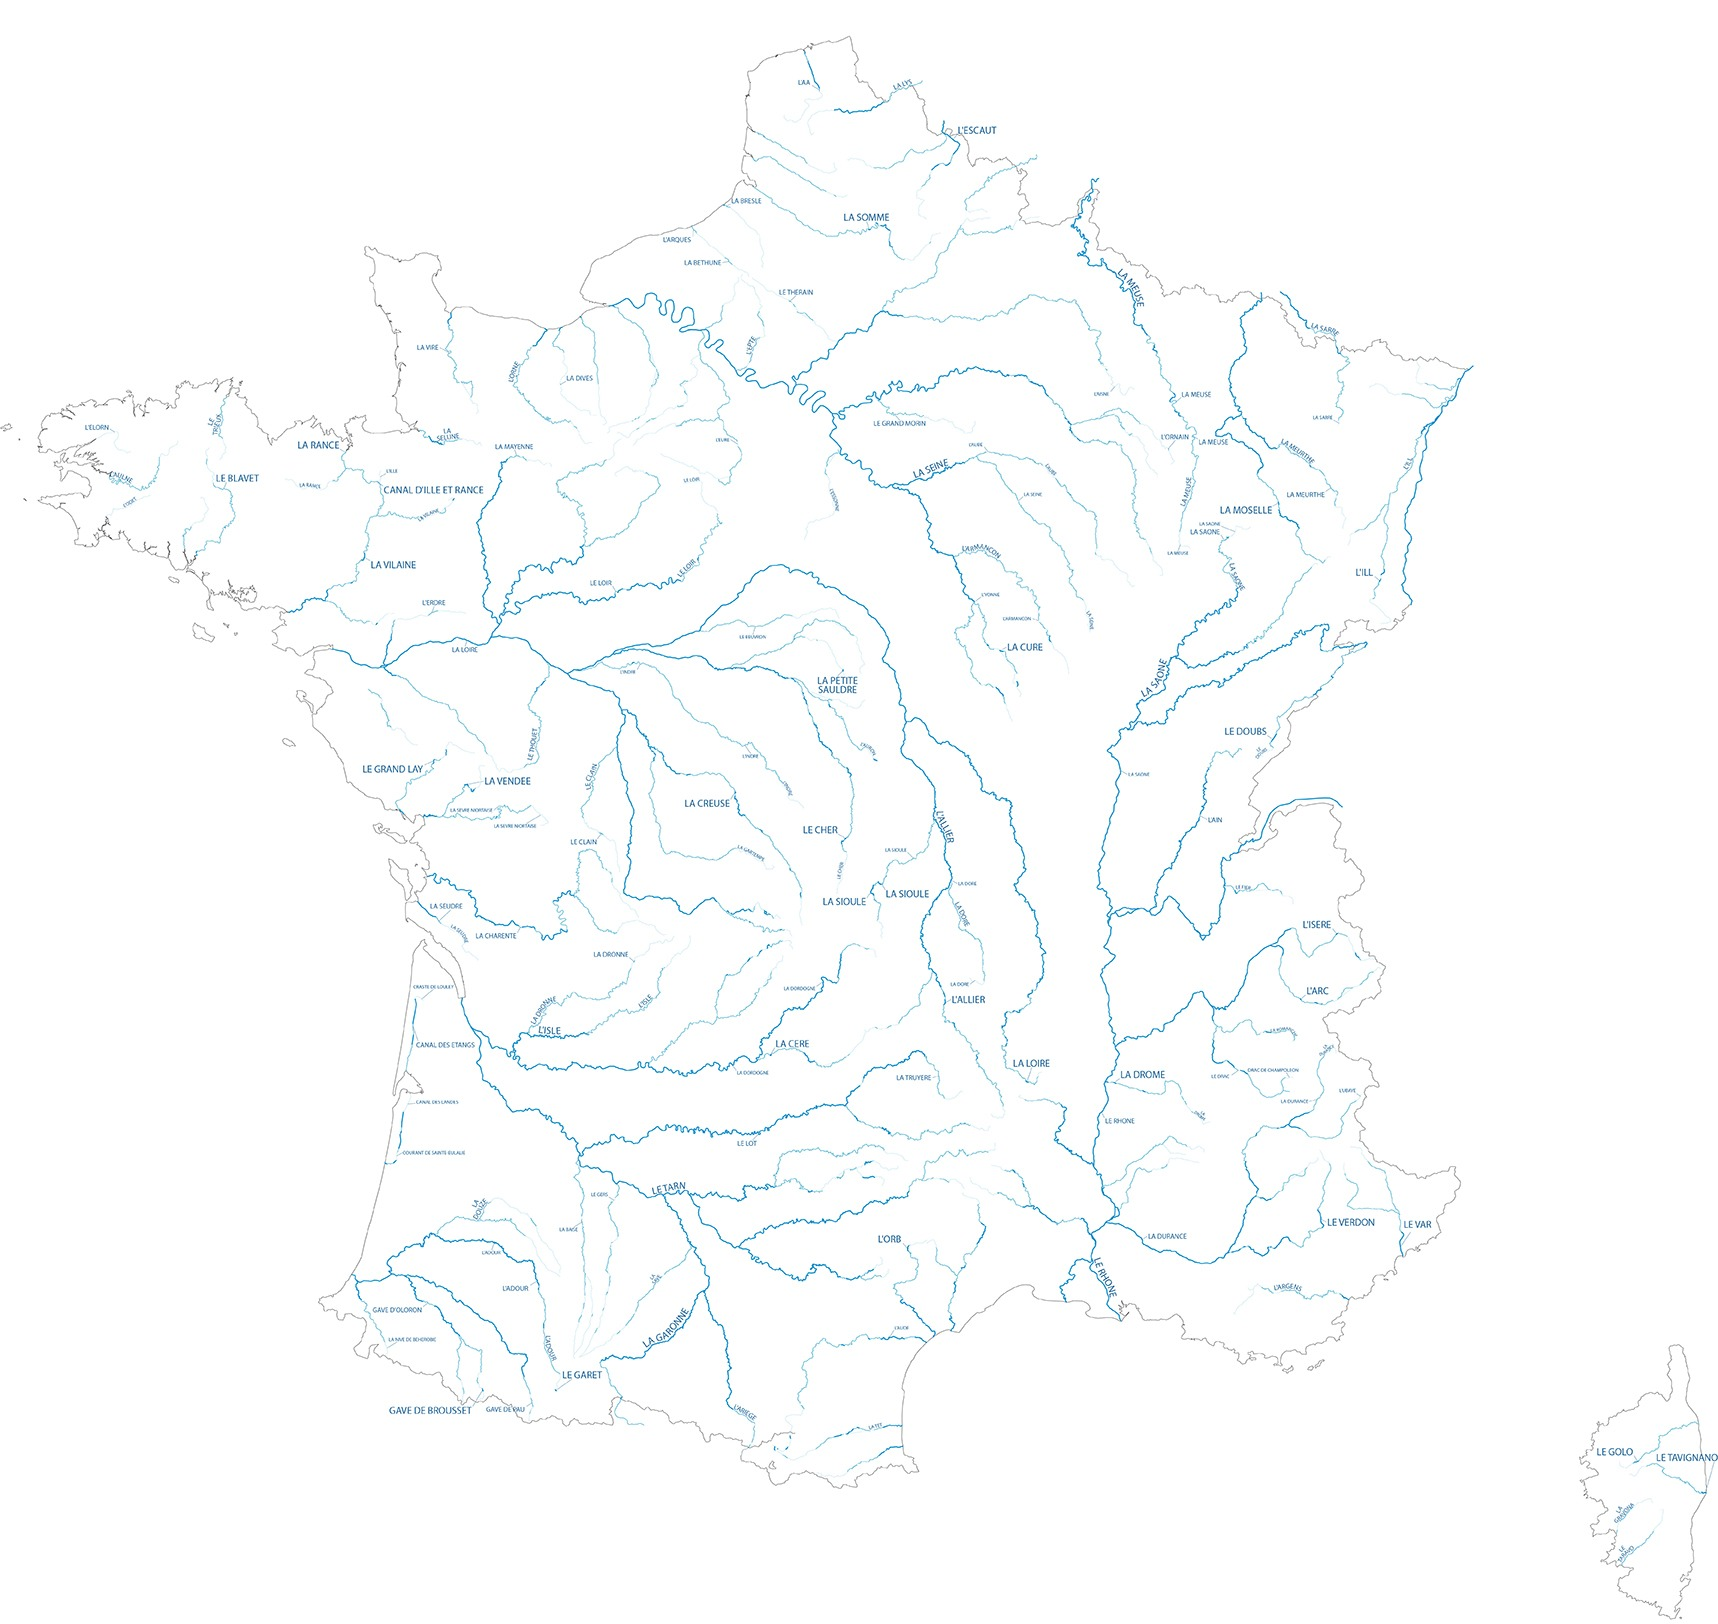 Hydrographie SD france - Guillaume Sciaux - Cartographe professionnel